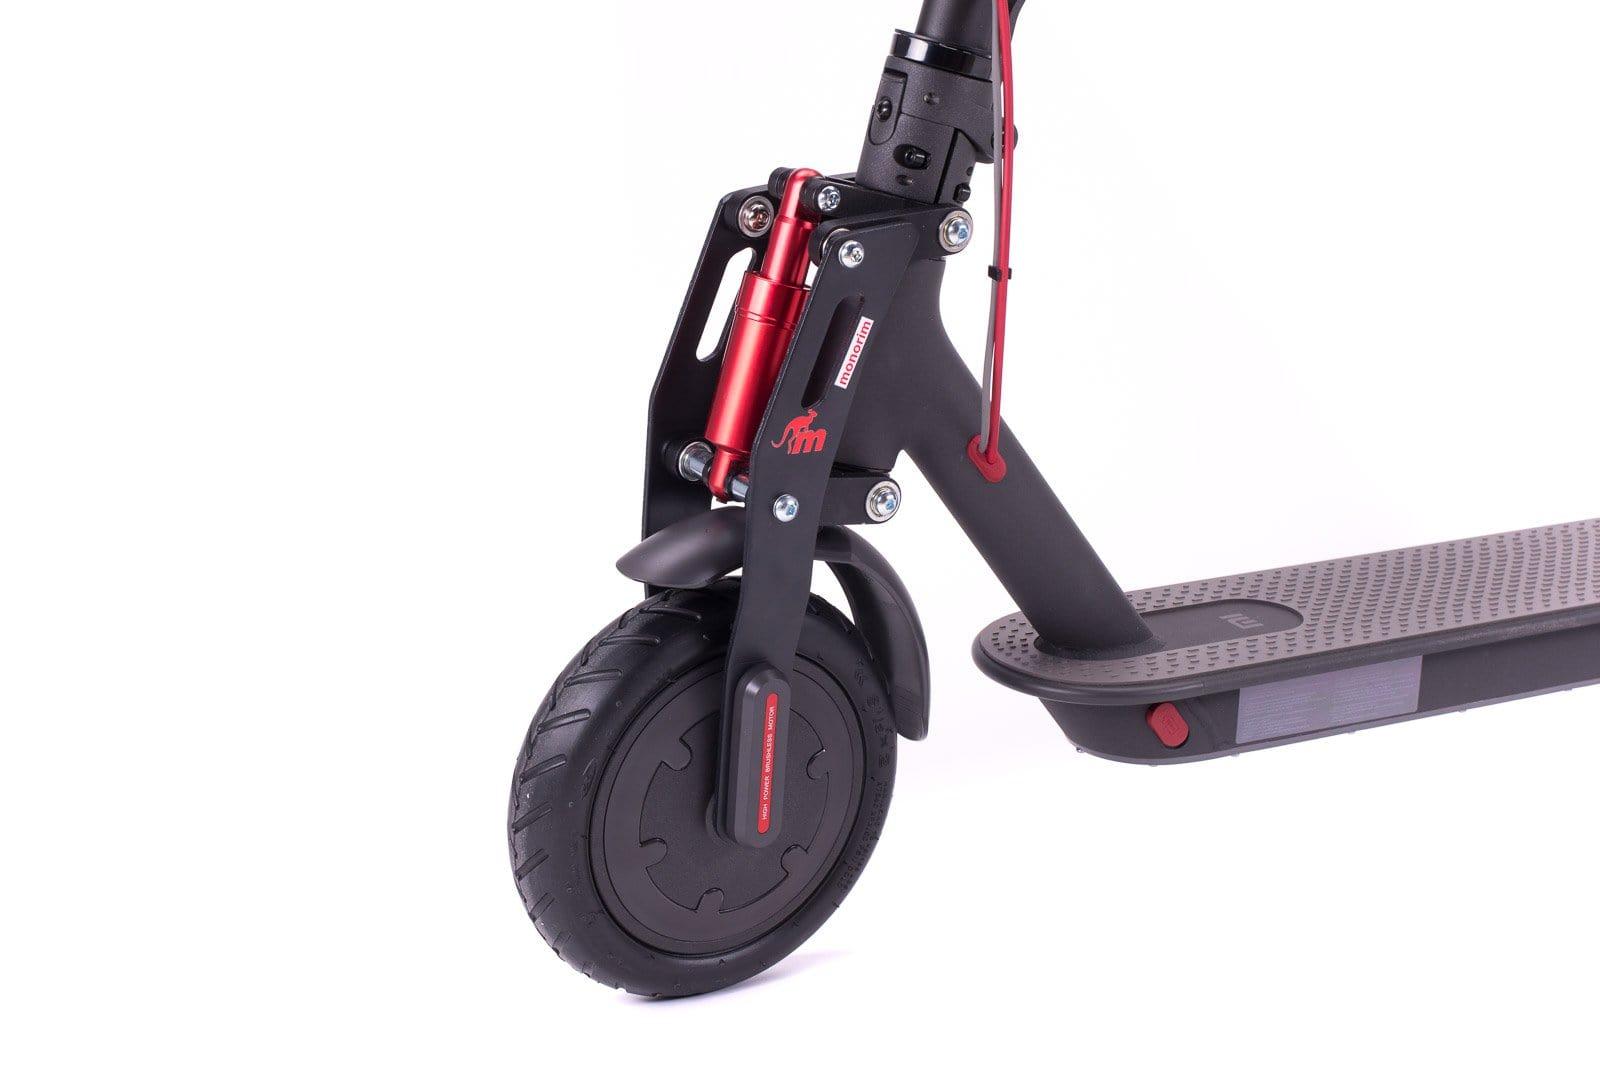 Monorim T0-S Suspension Kit for Xiaomi M365 Standard & Pro Scooters